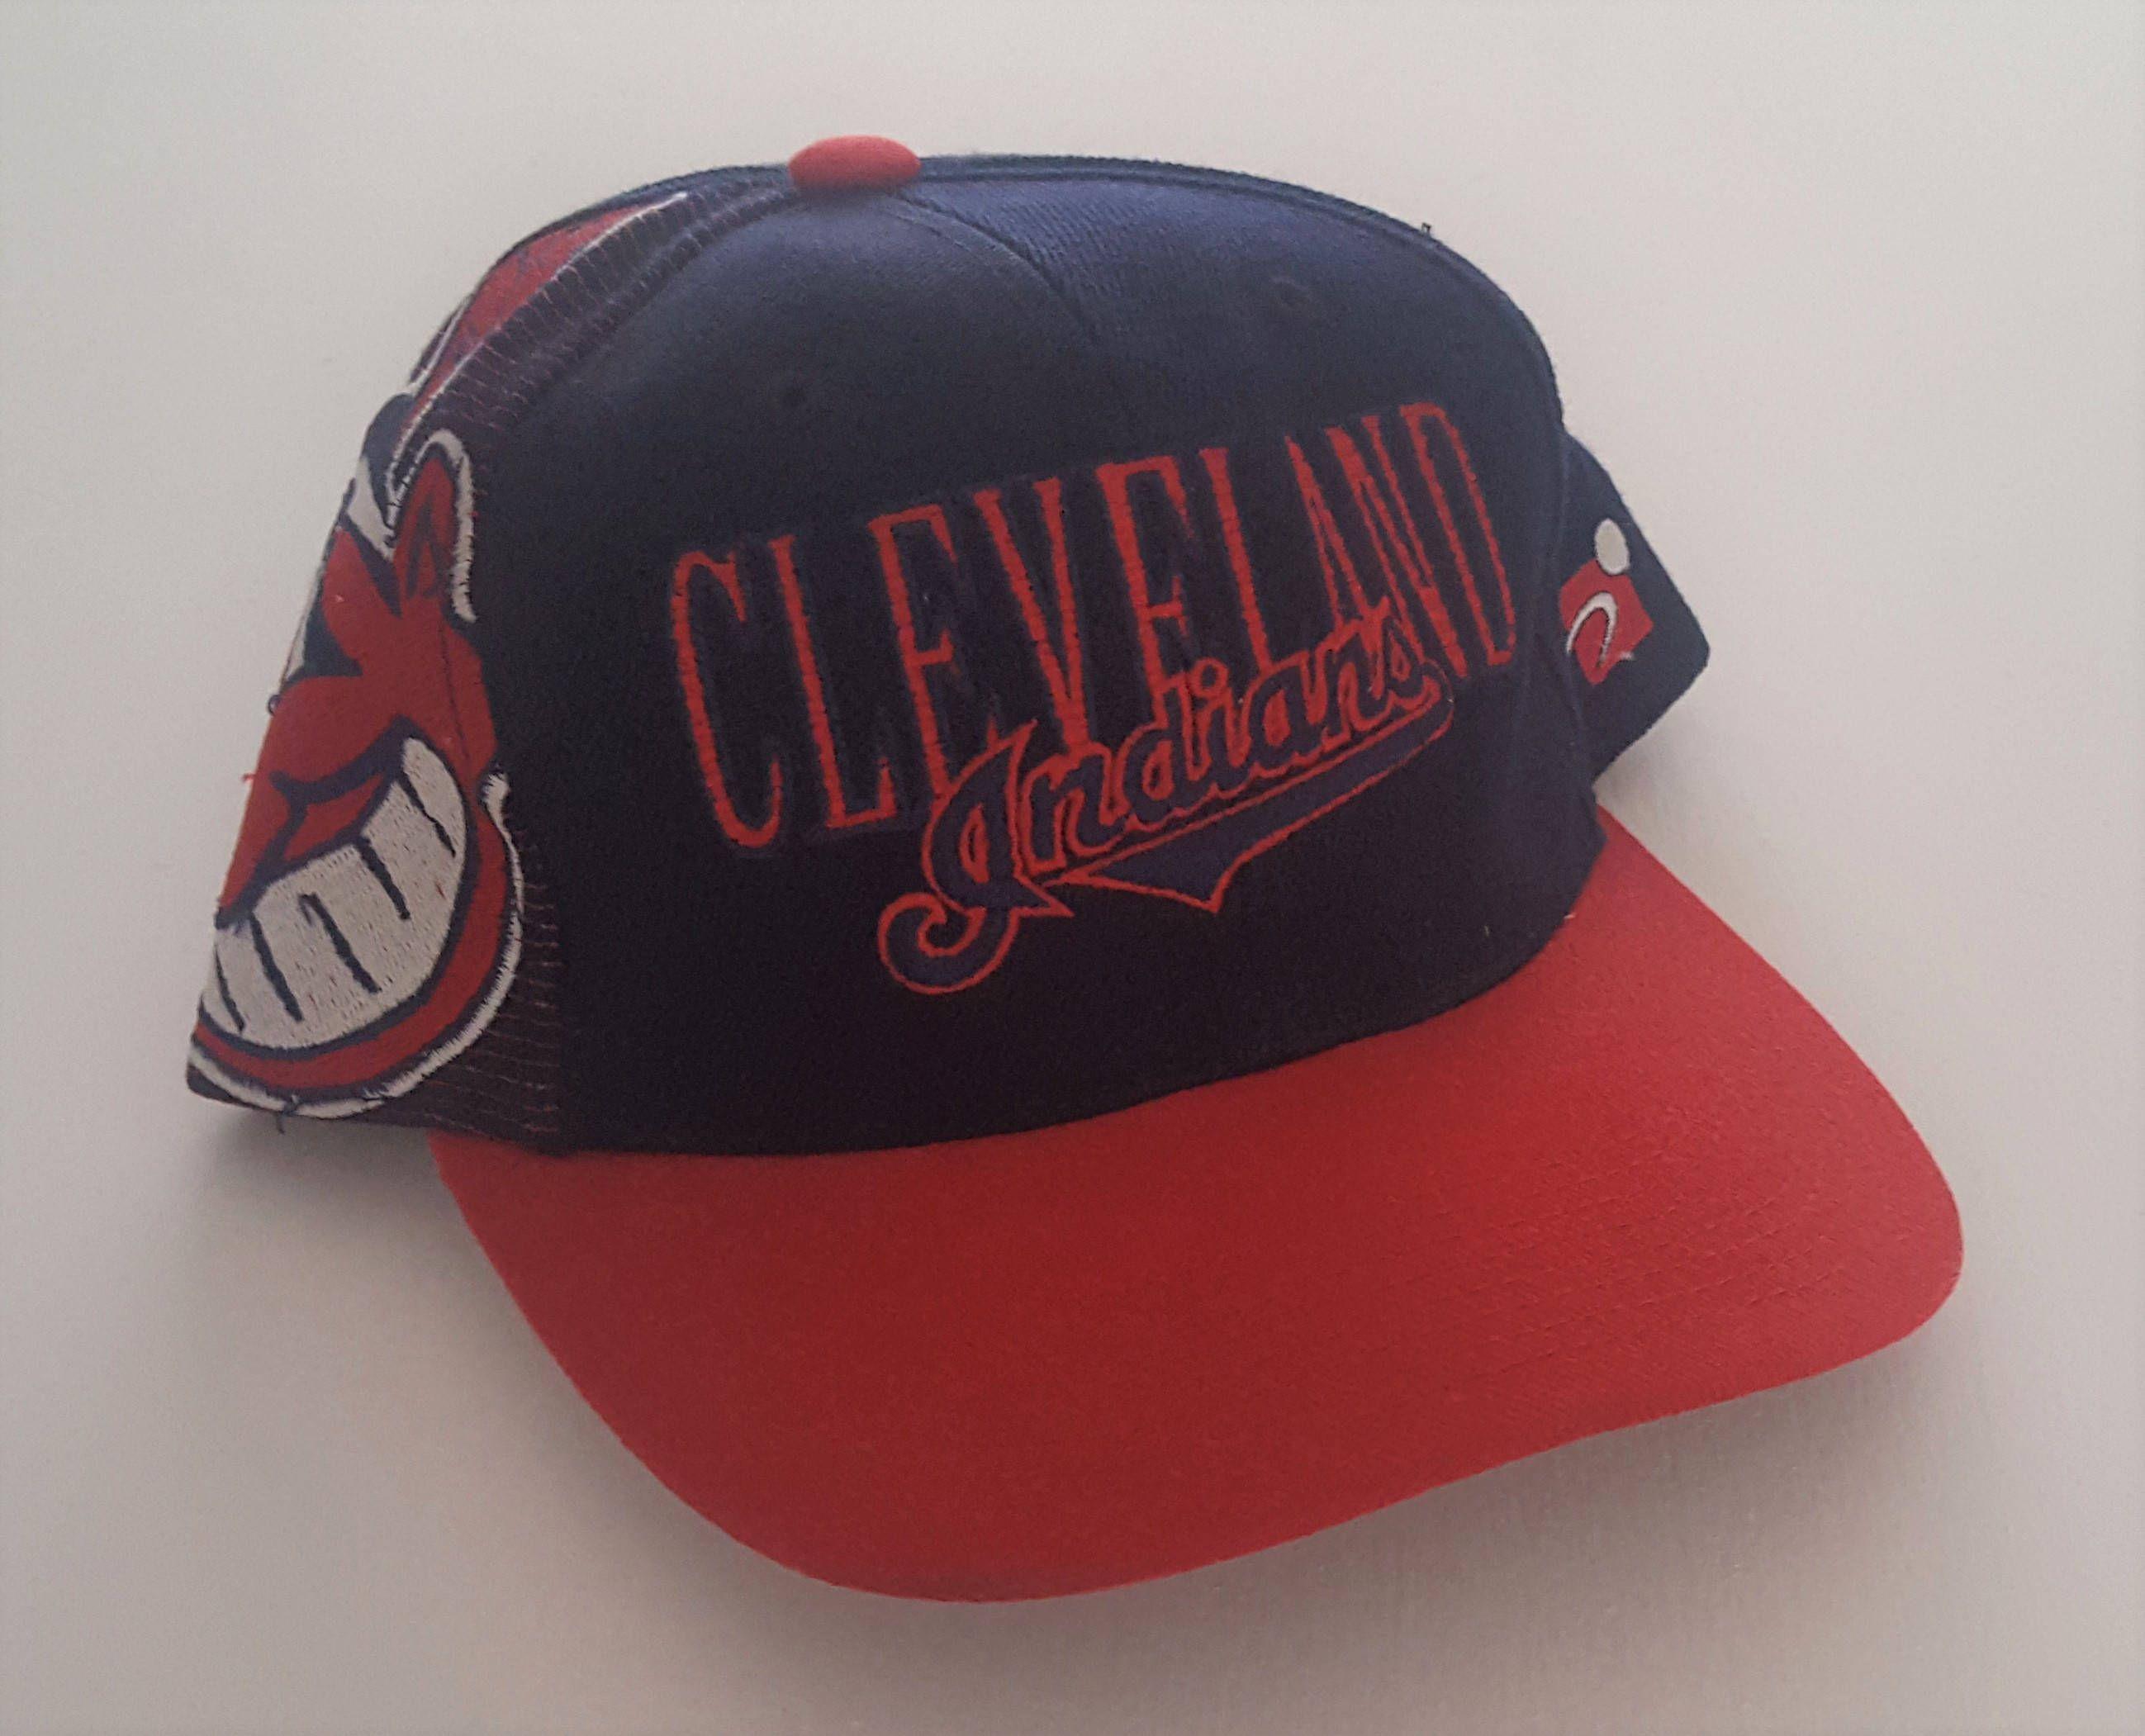 369d4eb2324564 Vintage Cleveland Indians Sports Specialties Snapback Hat MLB VTG by  StreetwearAndVintage on Etsy